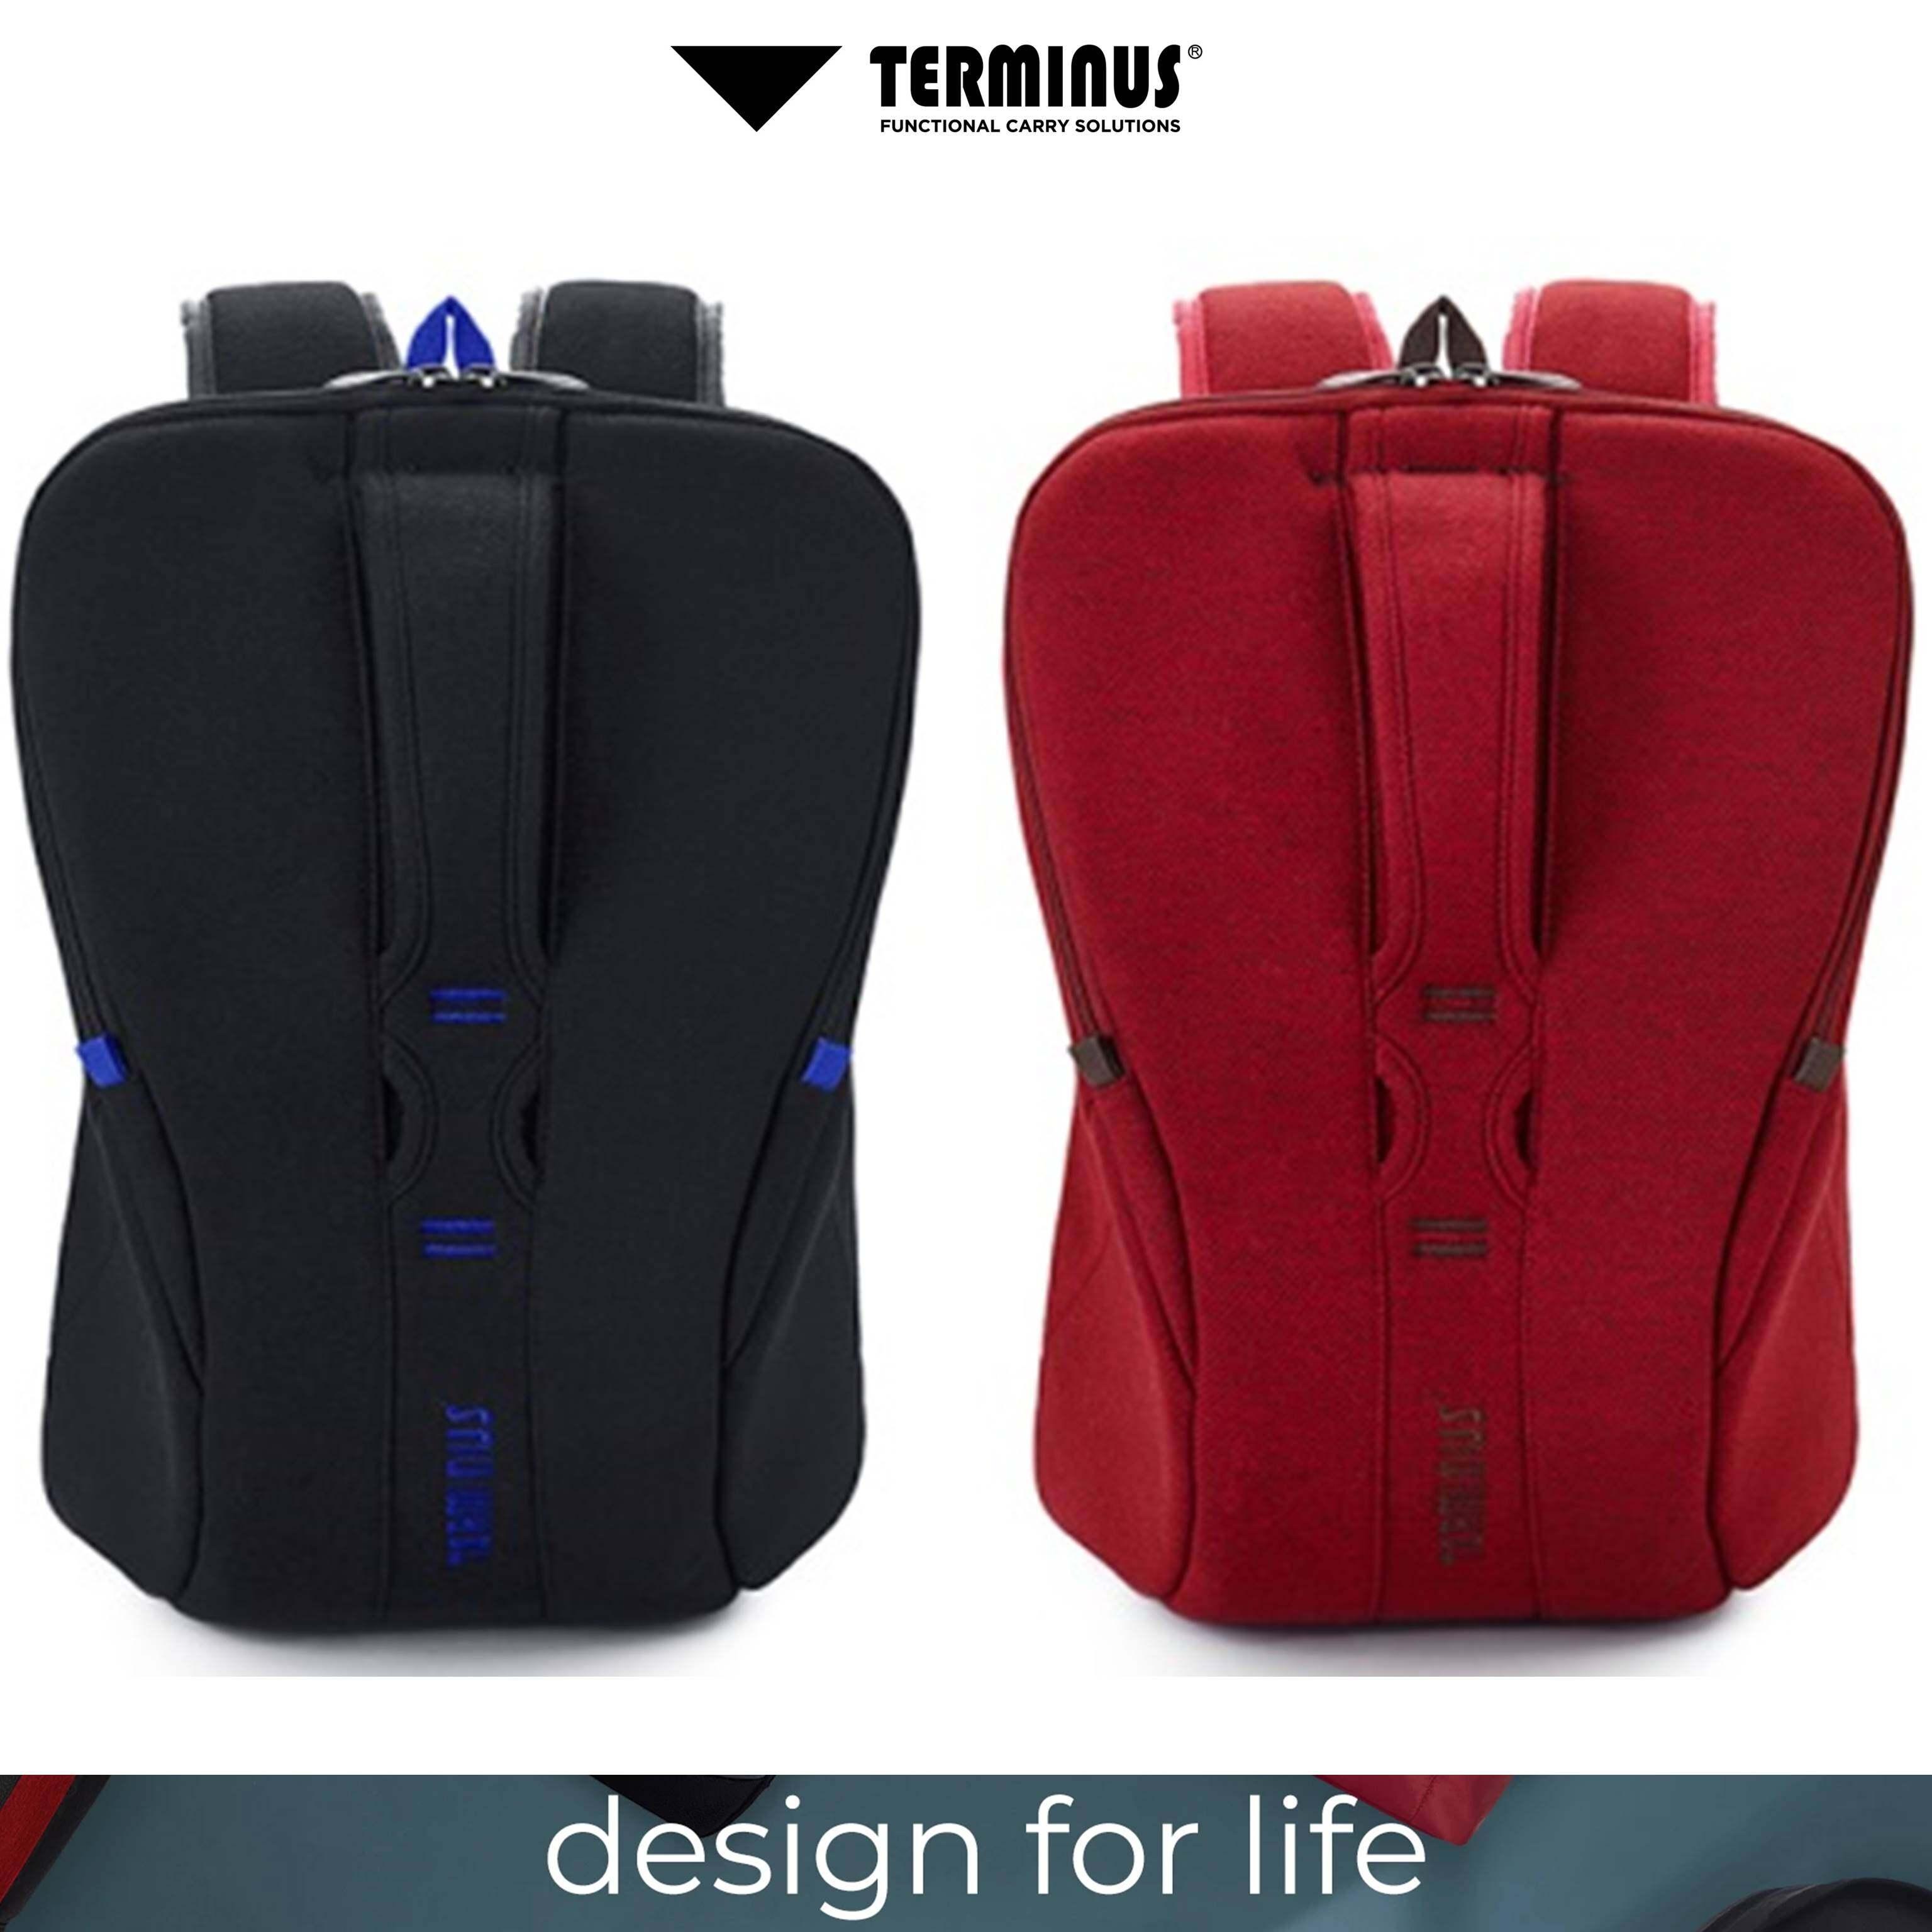 TERMINUS ® WOOLEVARD 3.0 Anti Theft Backpack Business Laptop Backpack Water Resistant Bookbag Travel College School Bookbag Computer Bag